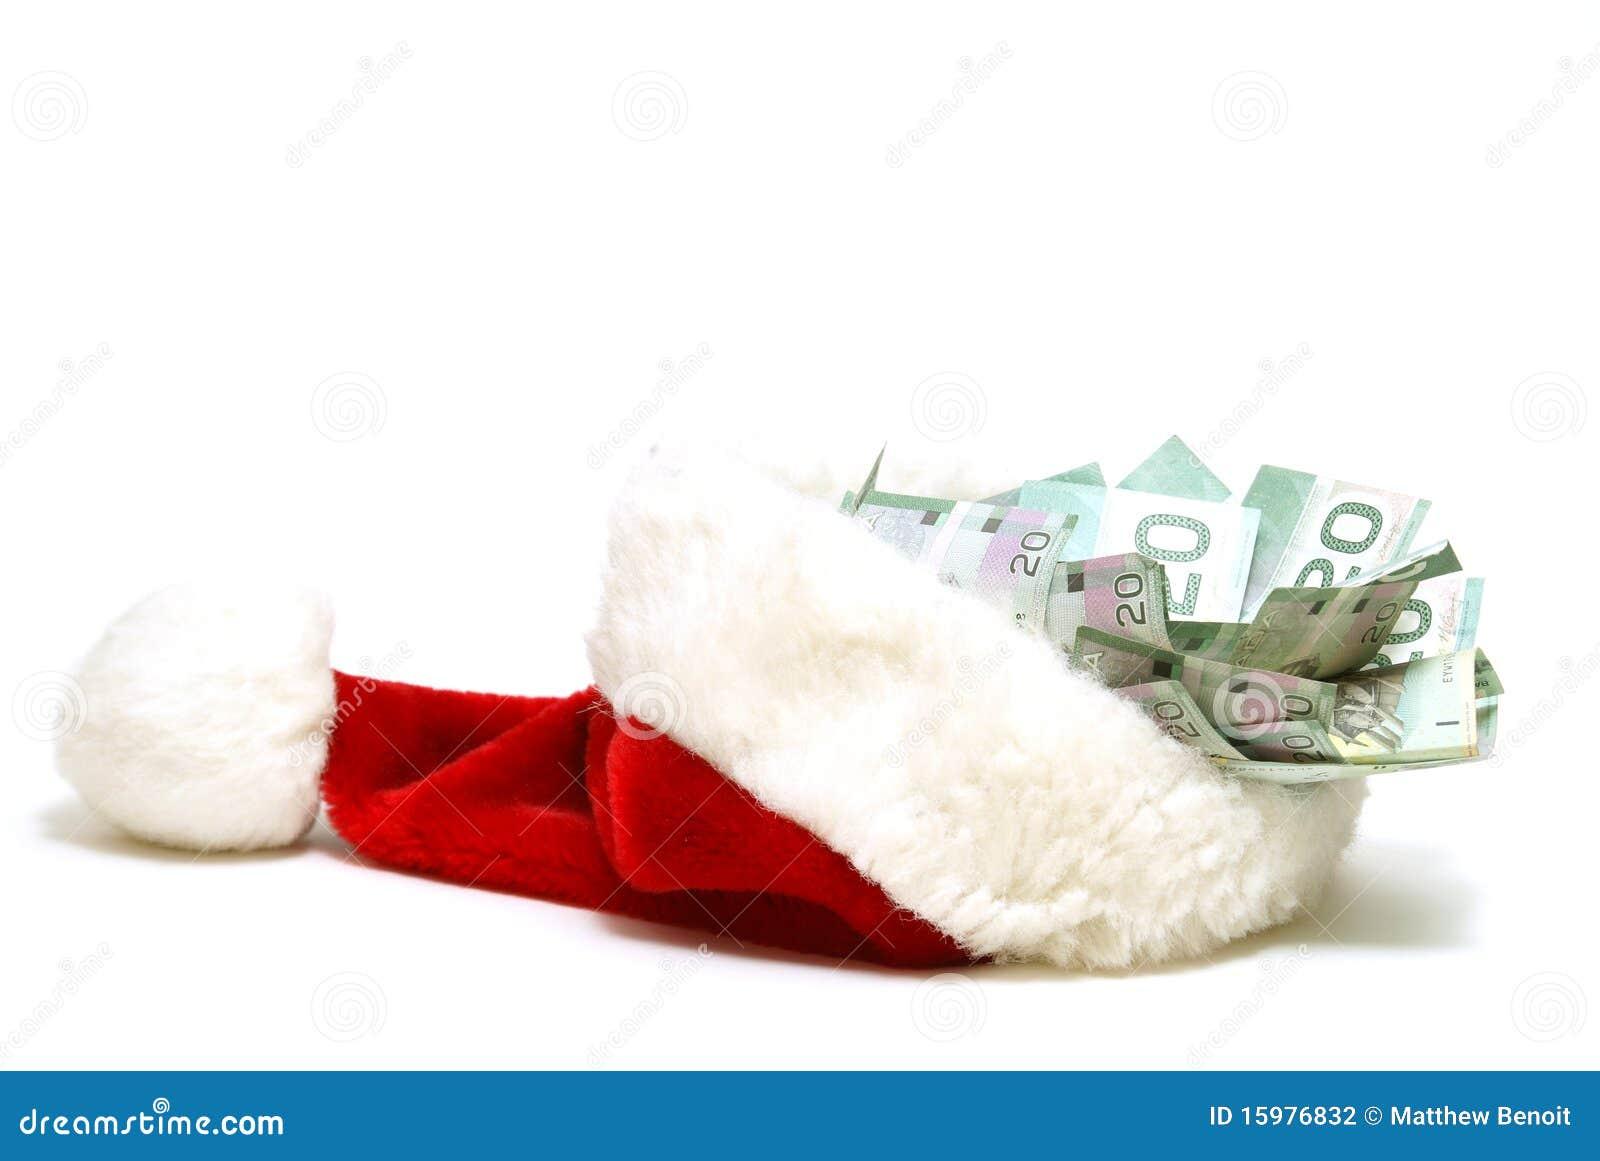 christmas money stock photo image of christmas money 15976832